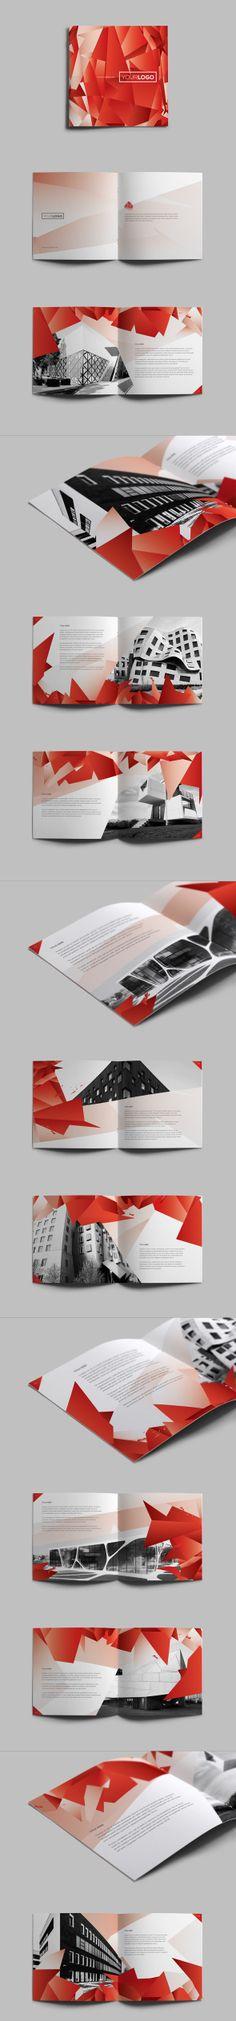 Ruby Square Brochure. Download here: http://graphicriver.net/item/ruby-square-brochure/4910099?ref=abradesign #design #brochure